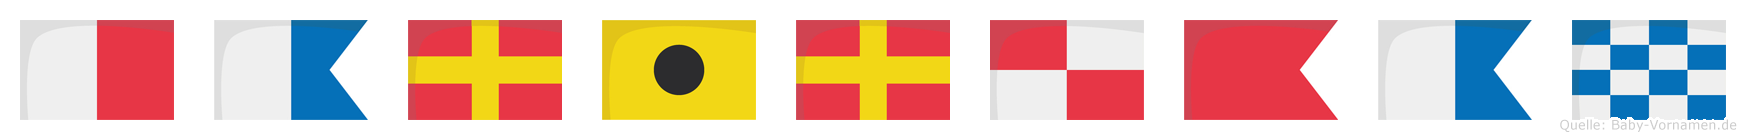 Hariruban im Flaggenalphabet